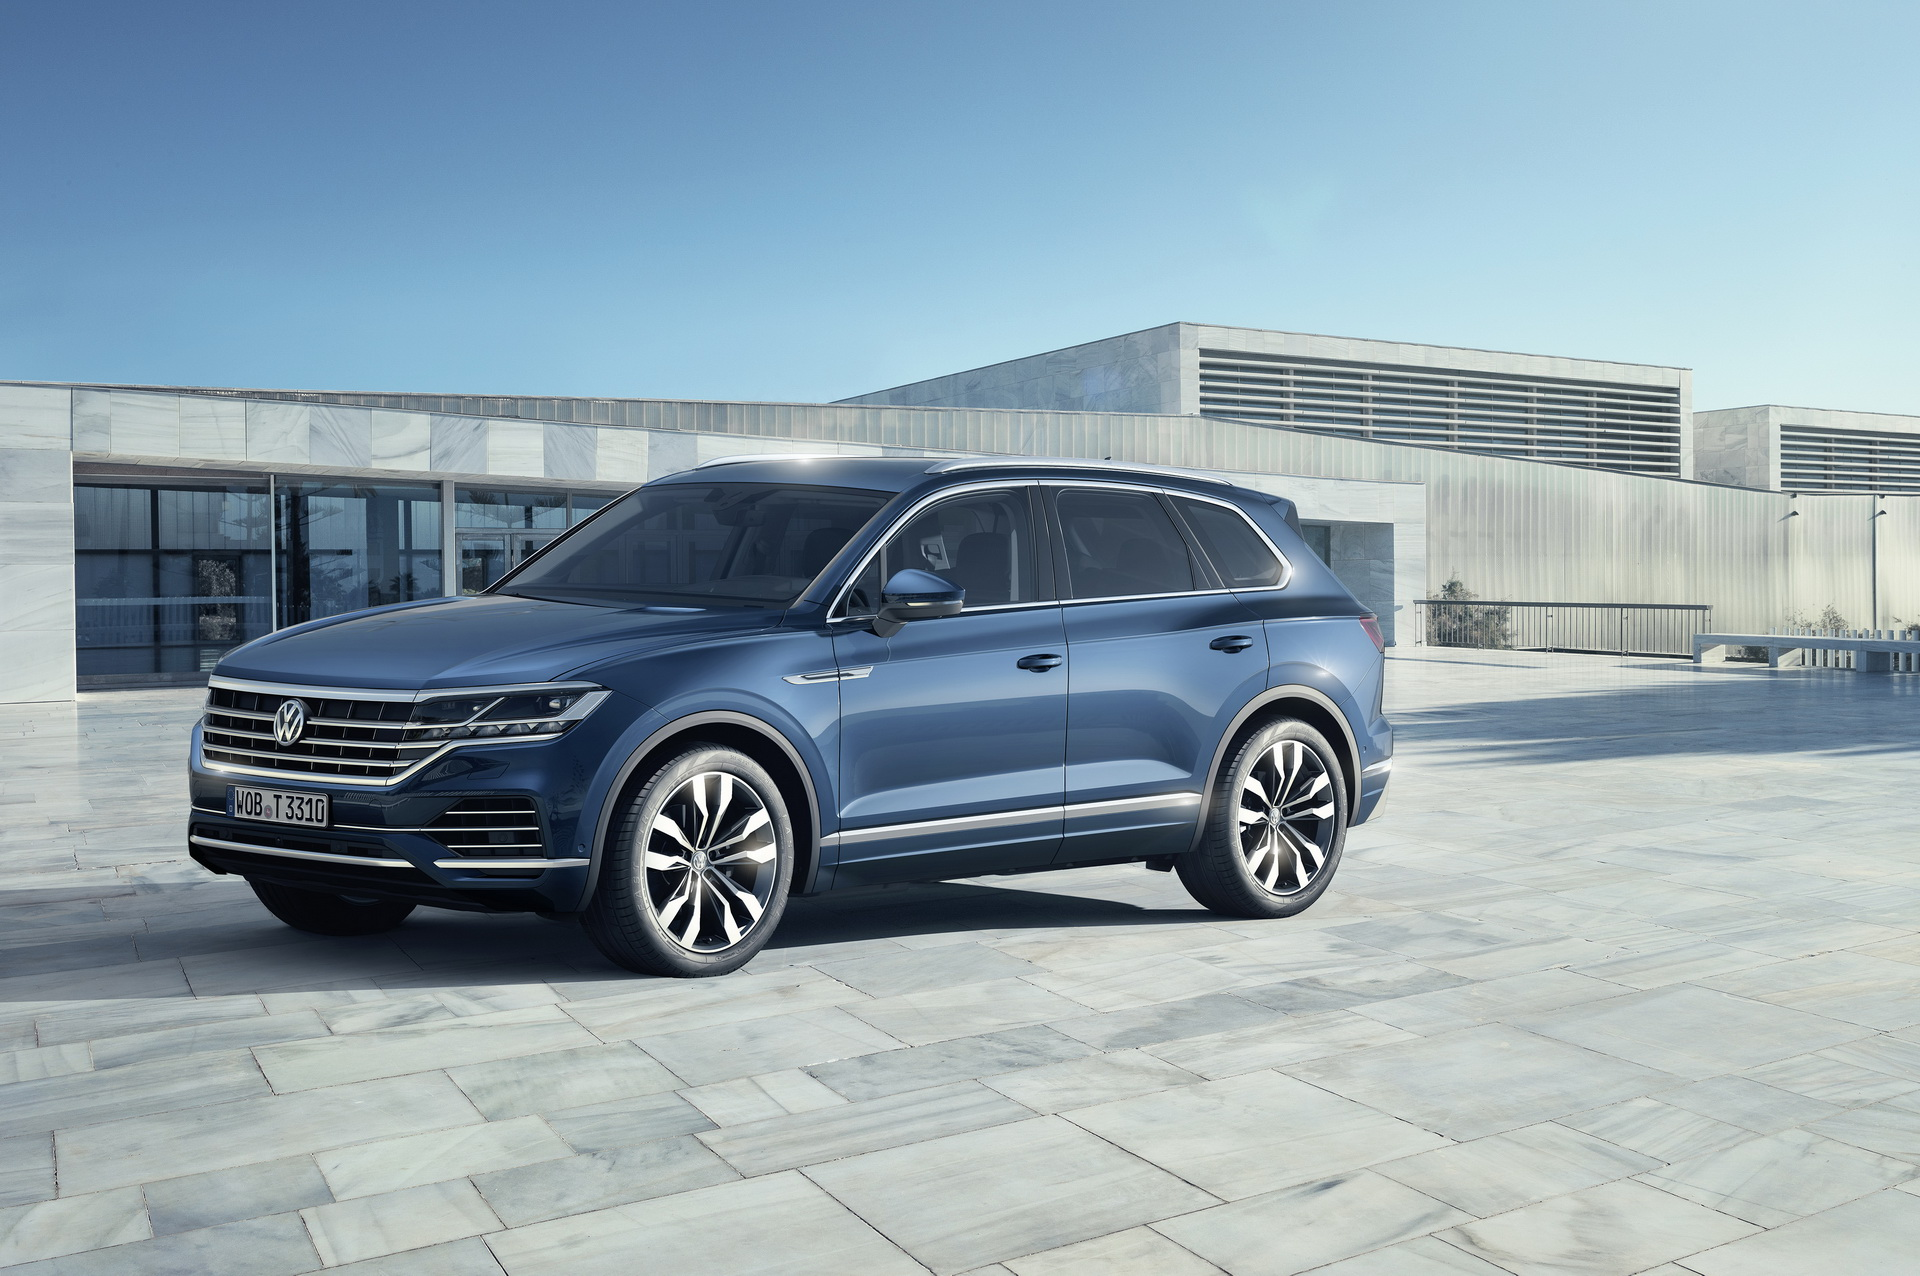 Volkswagen Touareg 2018 (13)